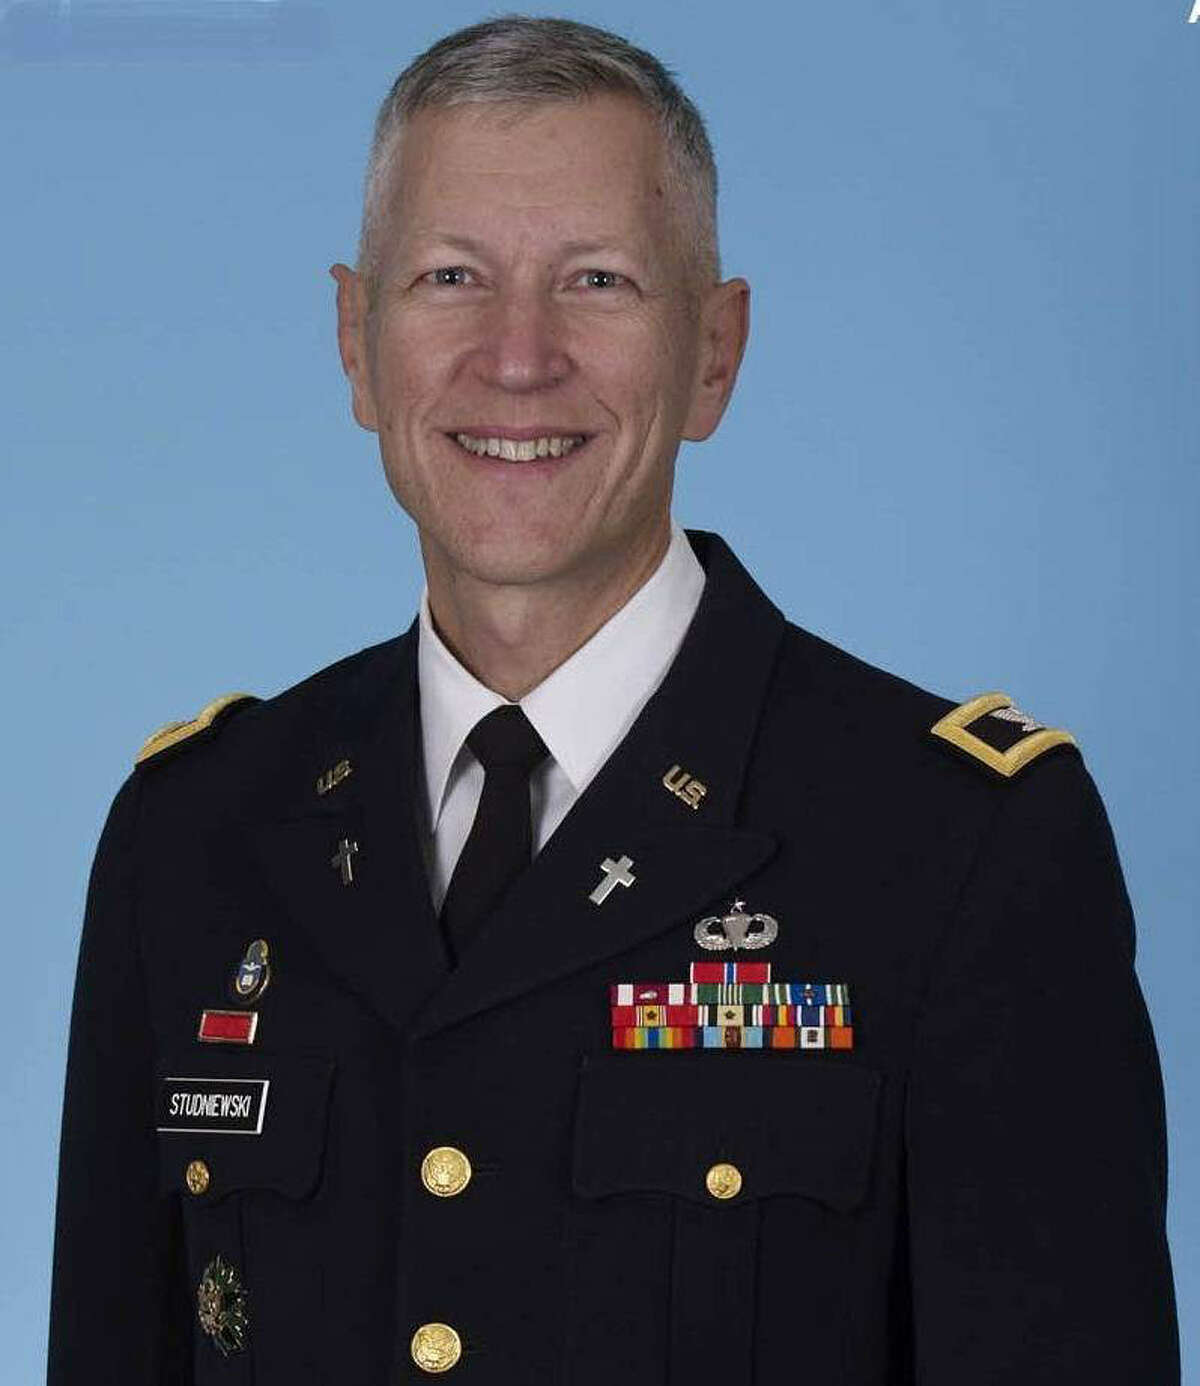 Col. Gary R. Studniewski is the command chaplain of U.S. Army North at Fort Sam Houston.